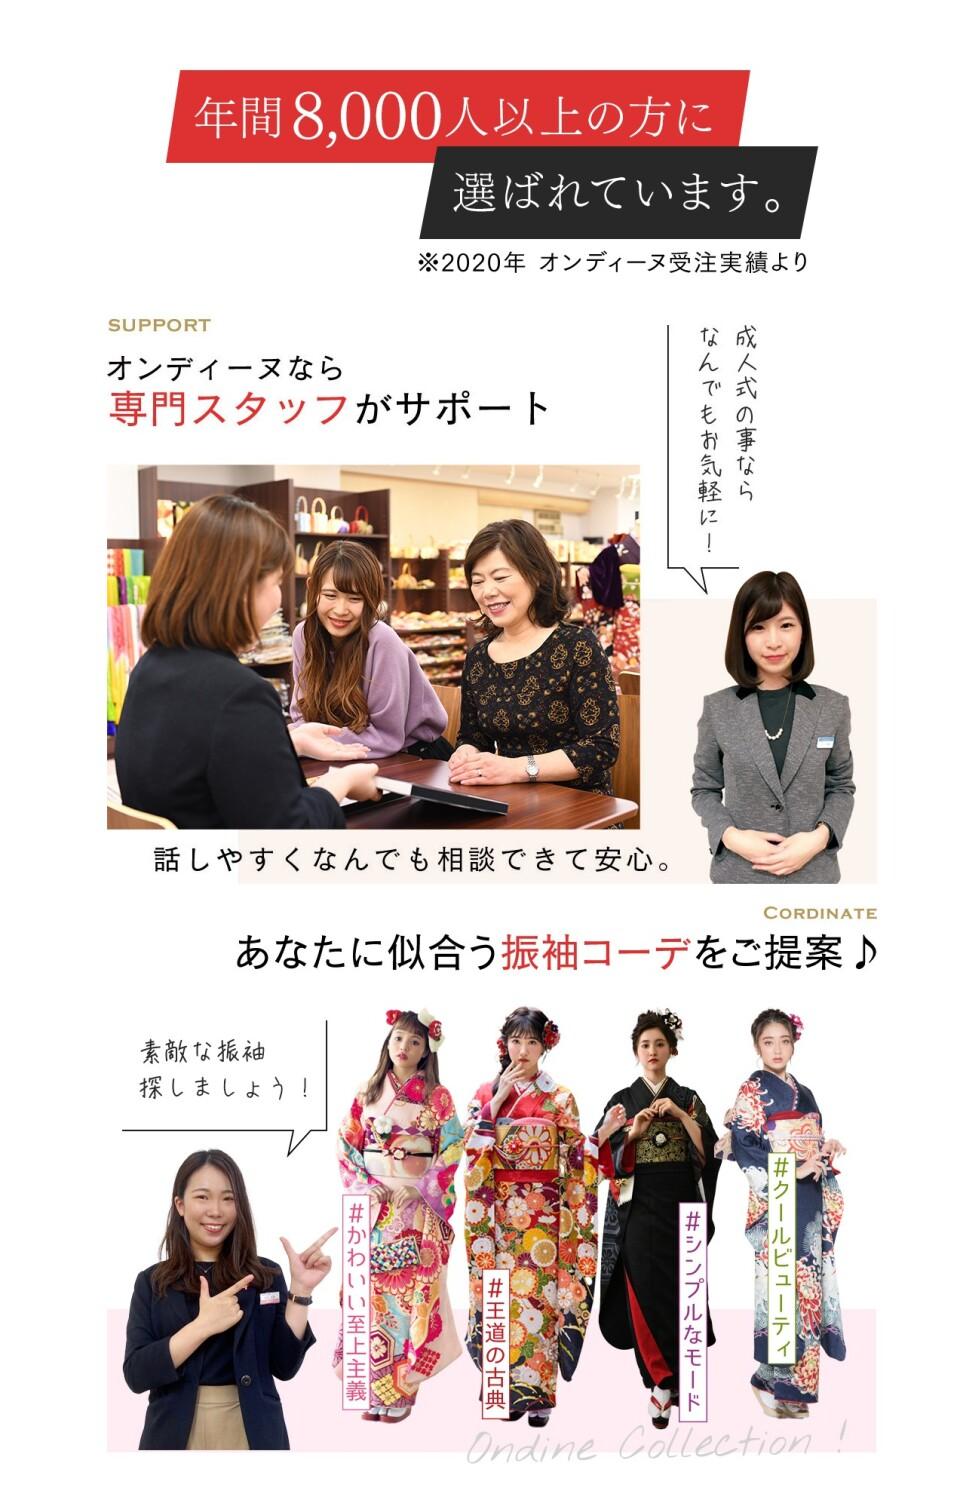 FireShot Capture 6415 - 振袖グランマルシェ|成人式の振袖レンタル・販売オンディーヌ - www.ondine.jp